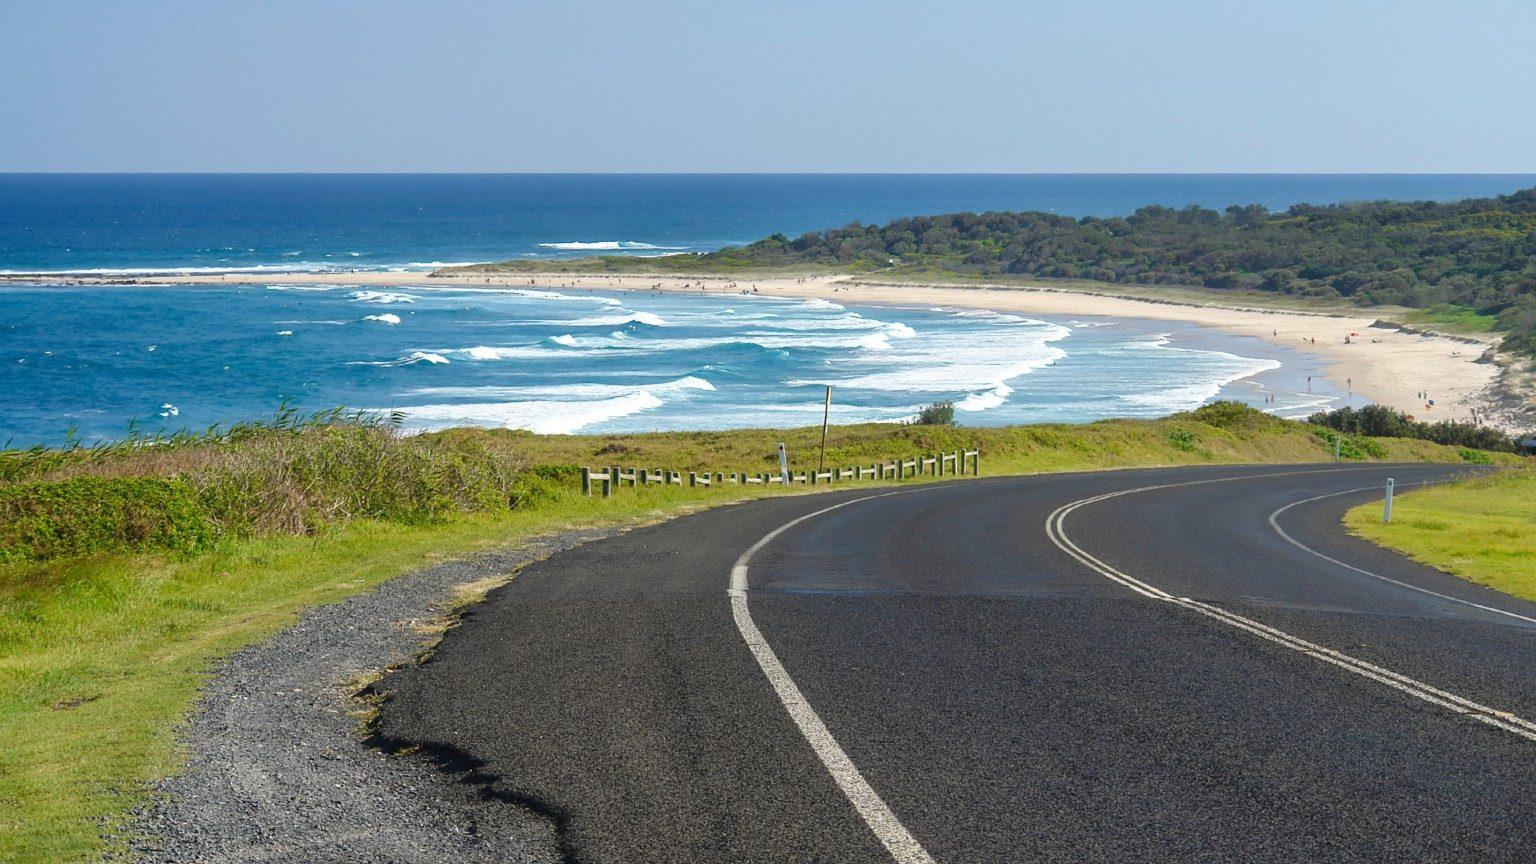 Road driving toward Coffs Harbour.